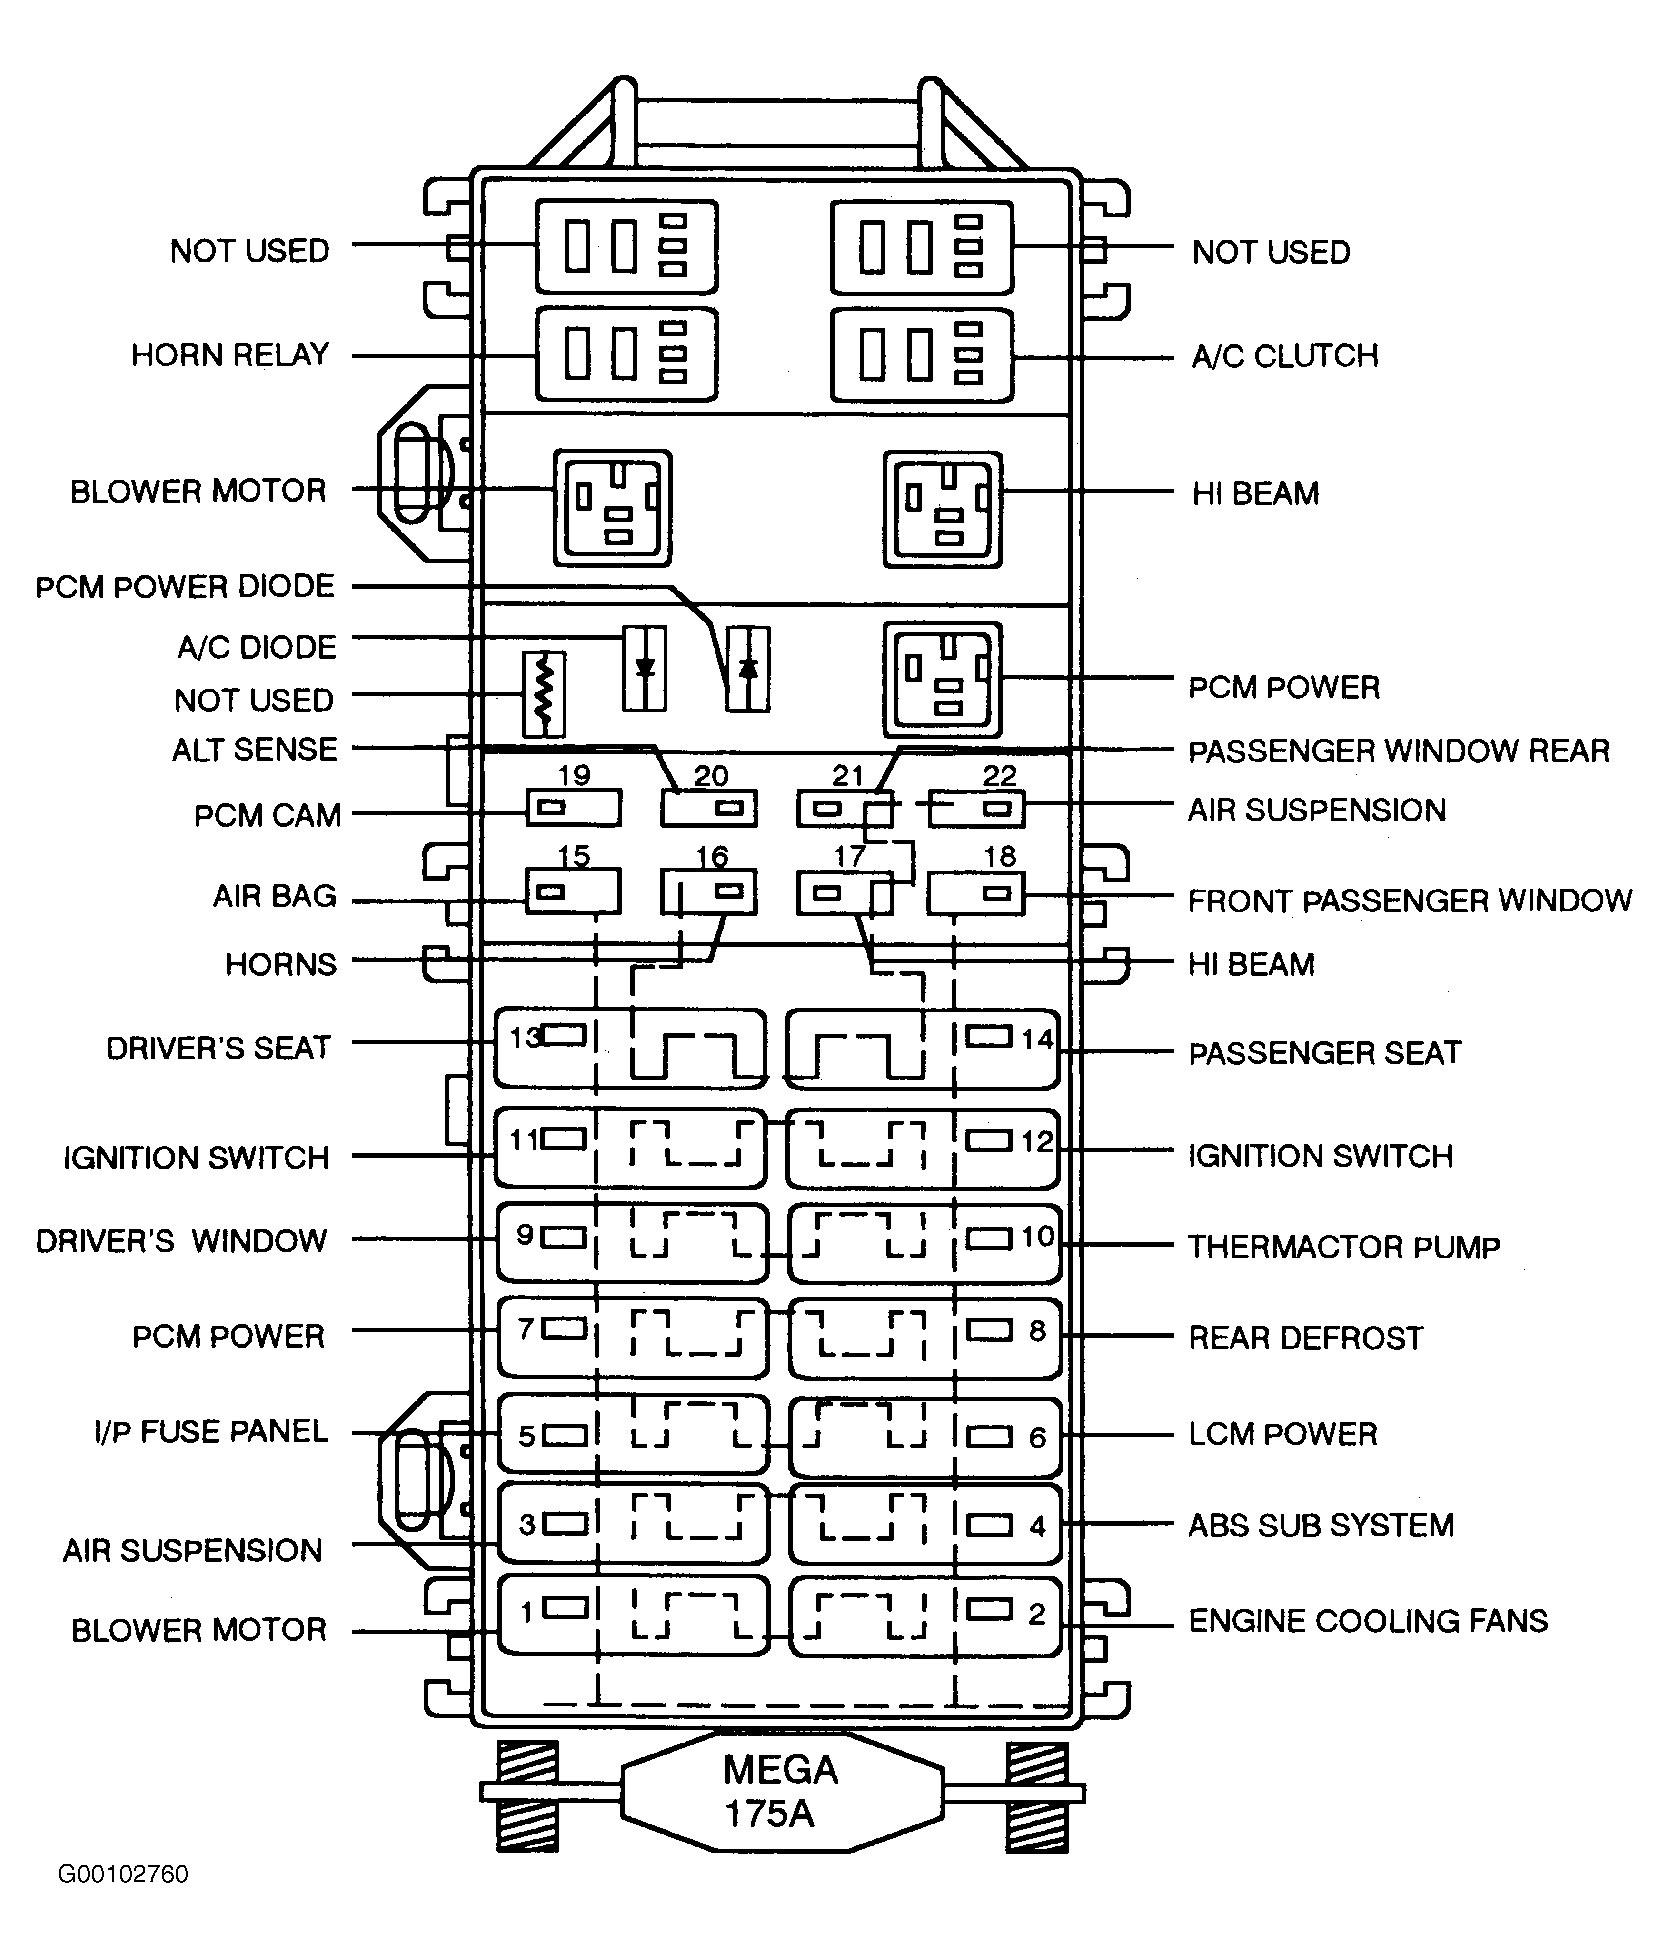 Ohv 8cyl Repair Guides Circuit Protection Fuses Autozonecom